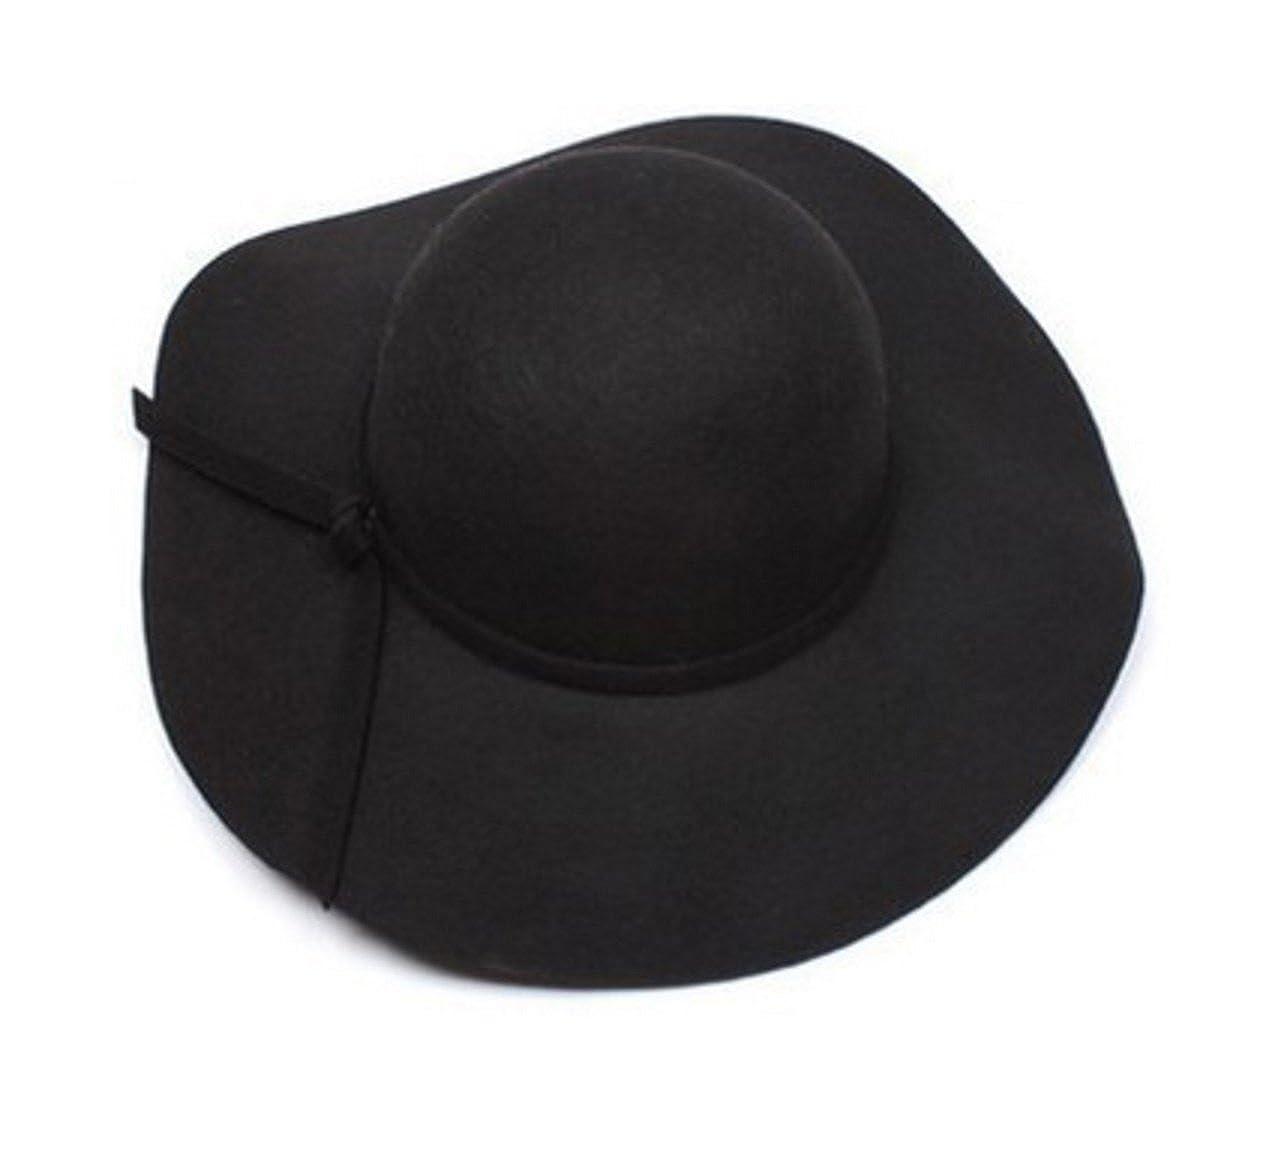 cfed9f65b64a3 Amazon.com  Onlineb2c Vintage Baby Girls Floppy Wide Brim Wool Felt Fedora  Cloche Hat Cap (Black)  Clothing